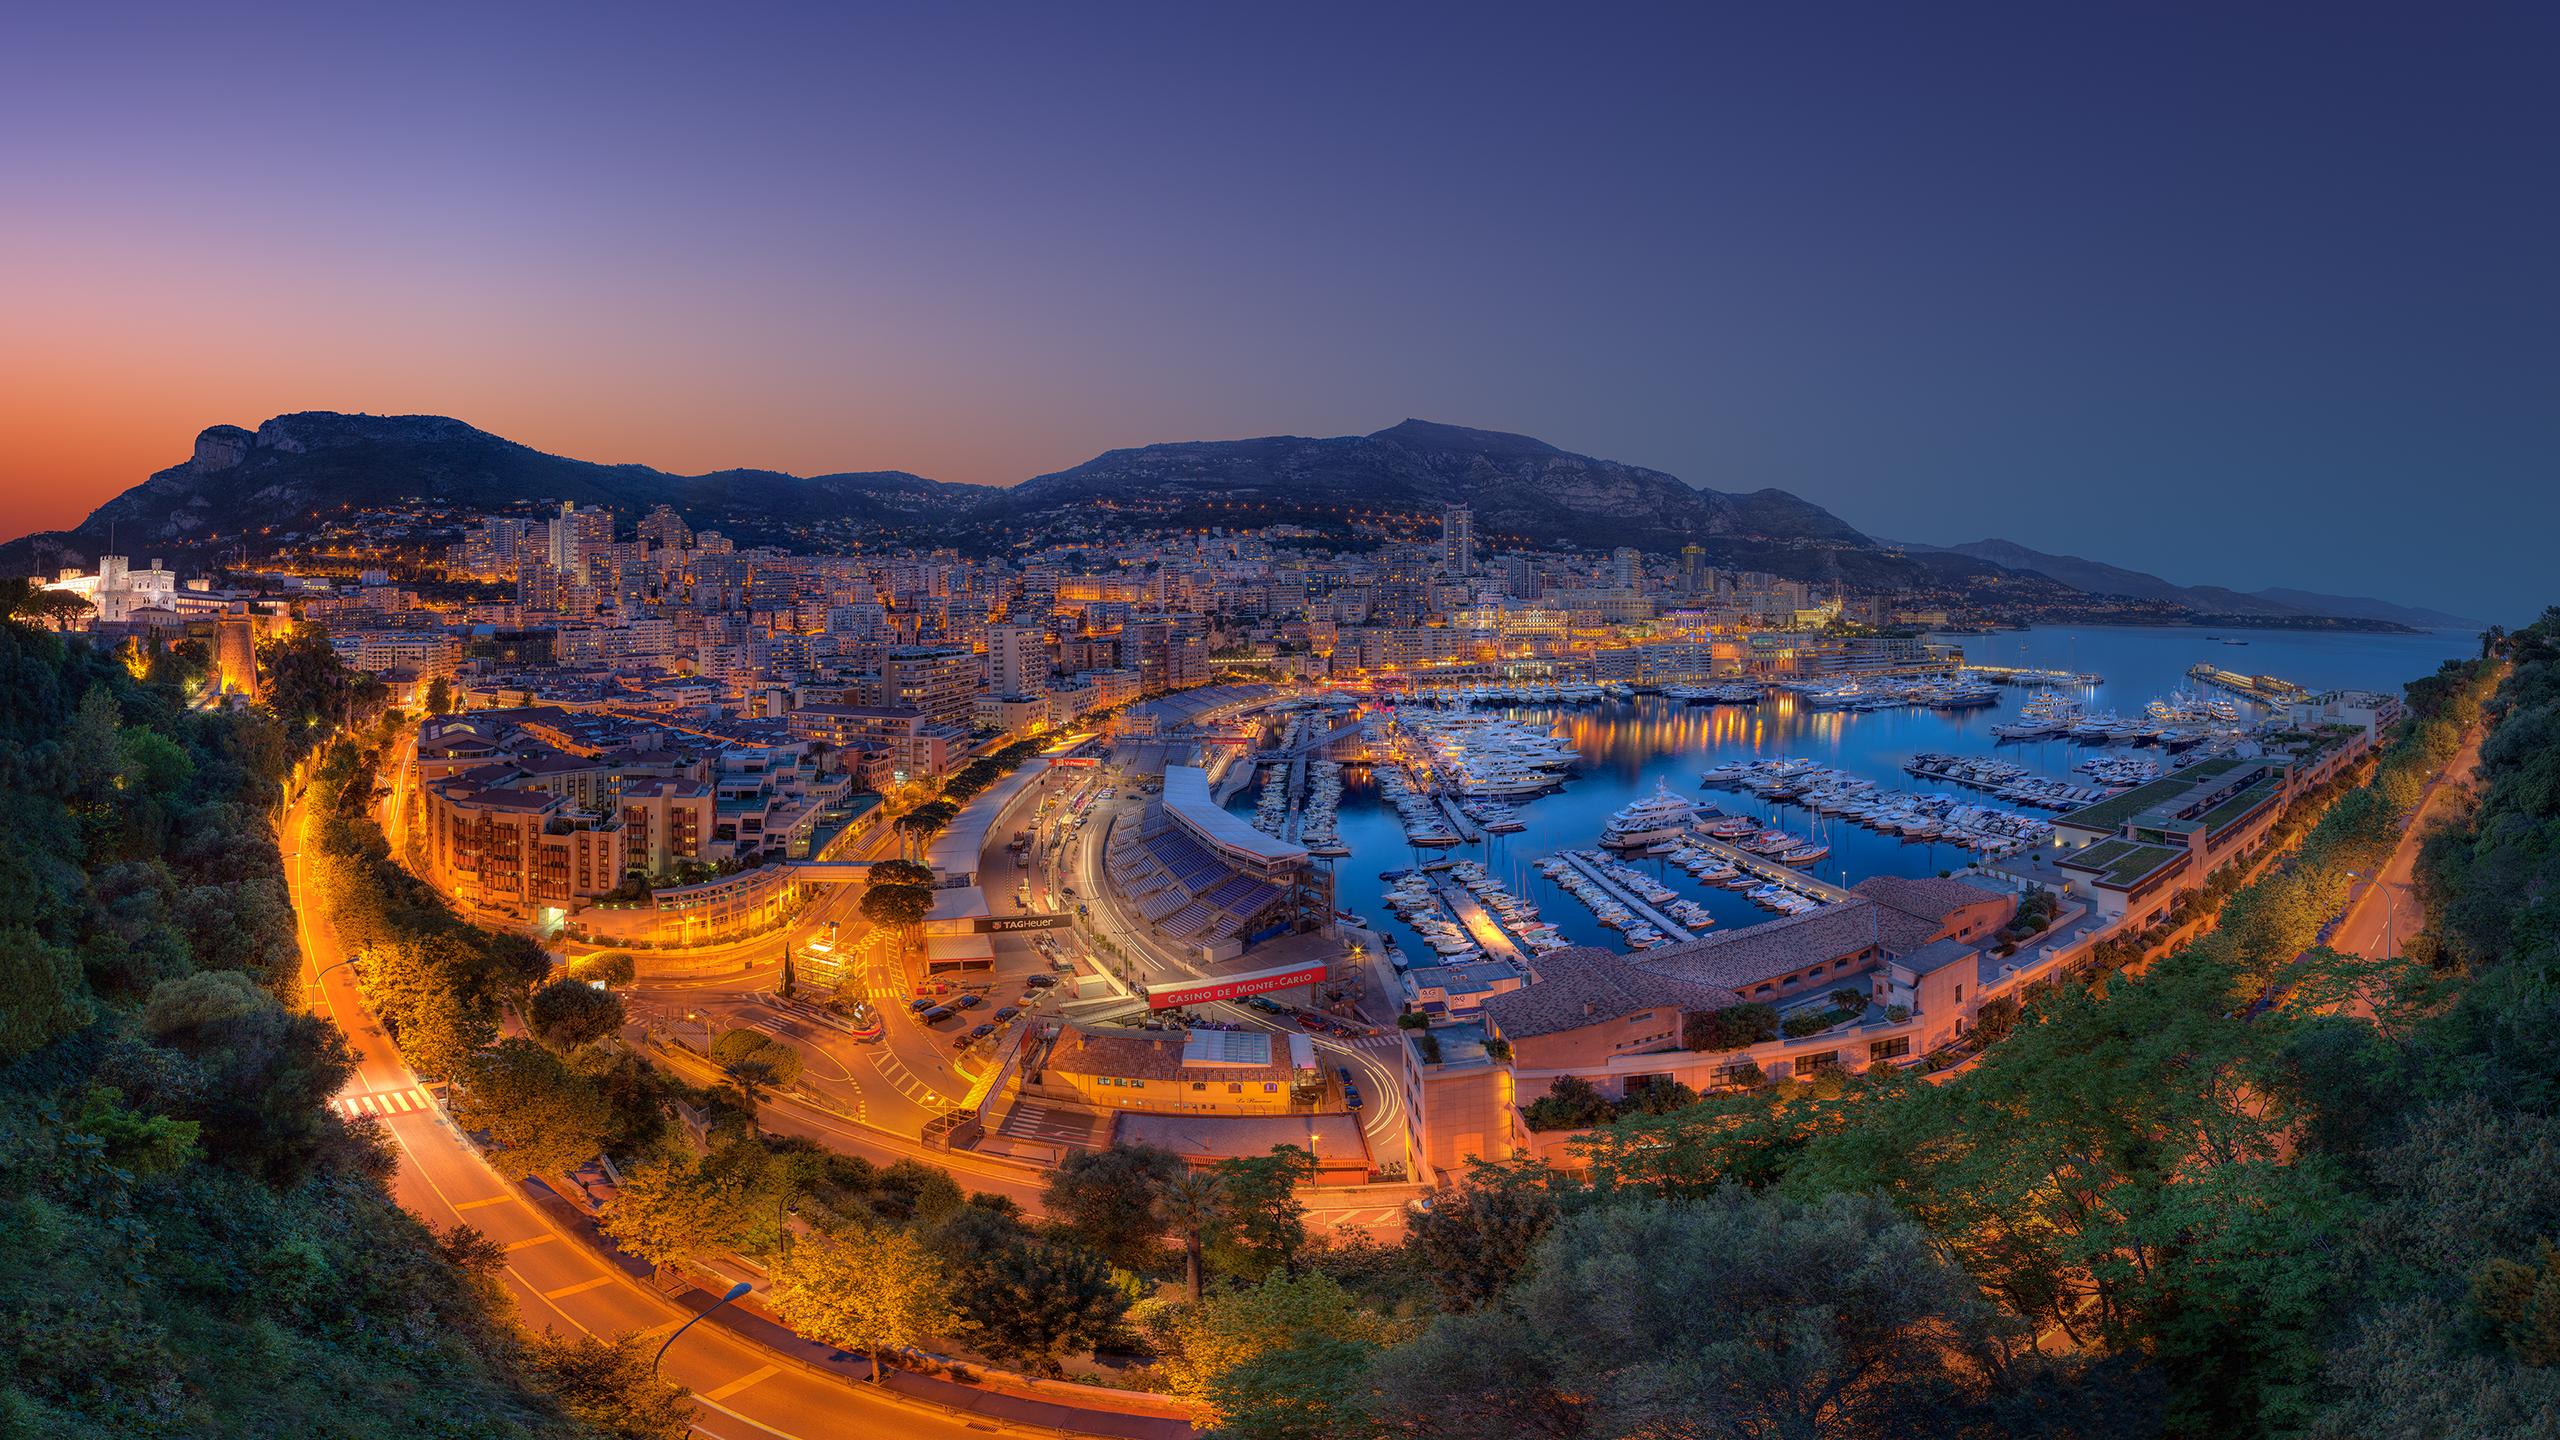 Formula 1 Grand Prix Fever at the Port Hercule of the Principali